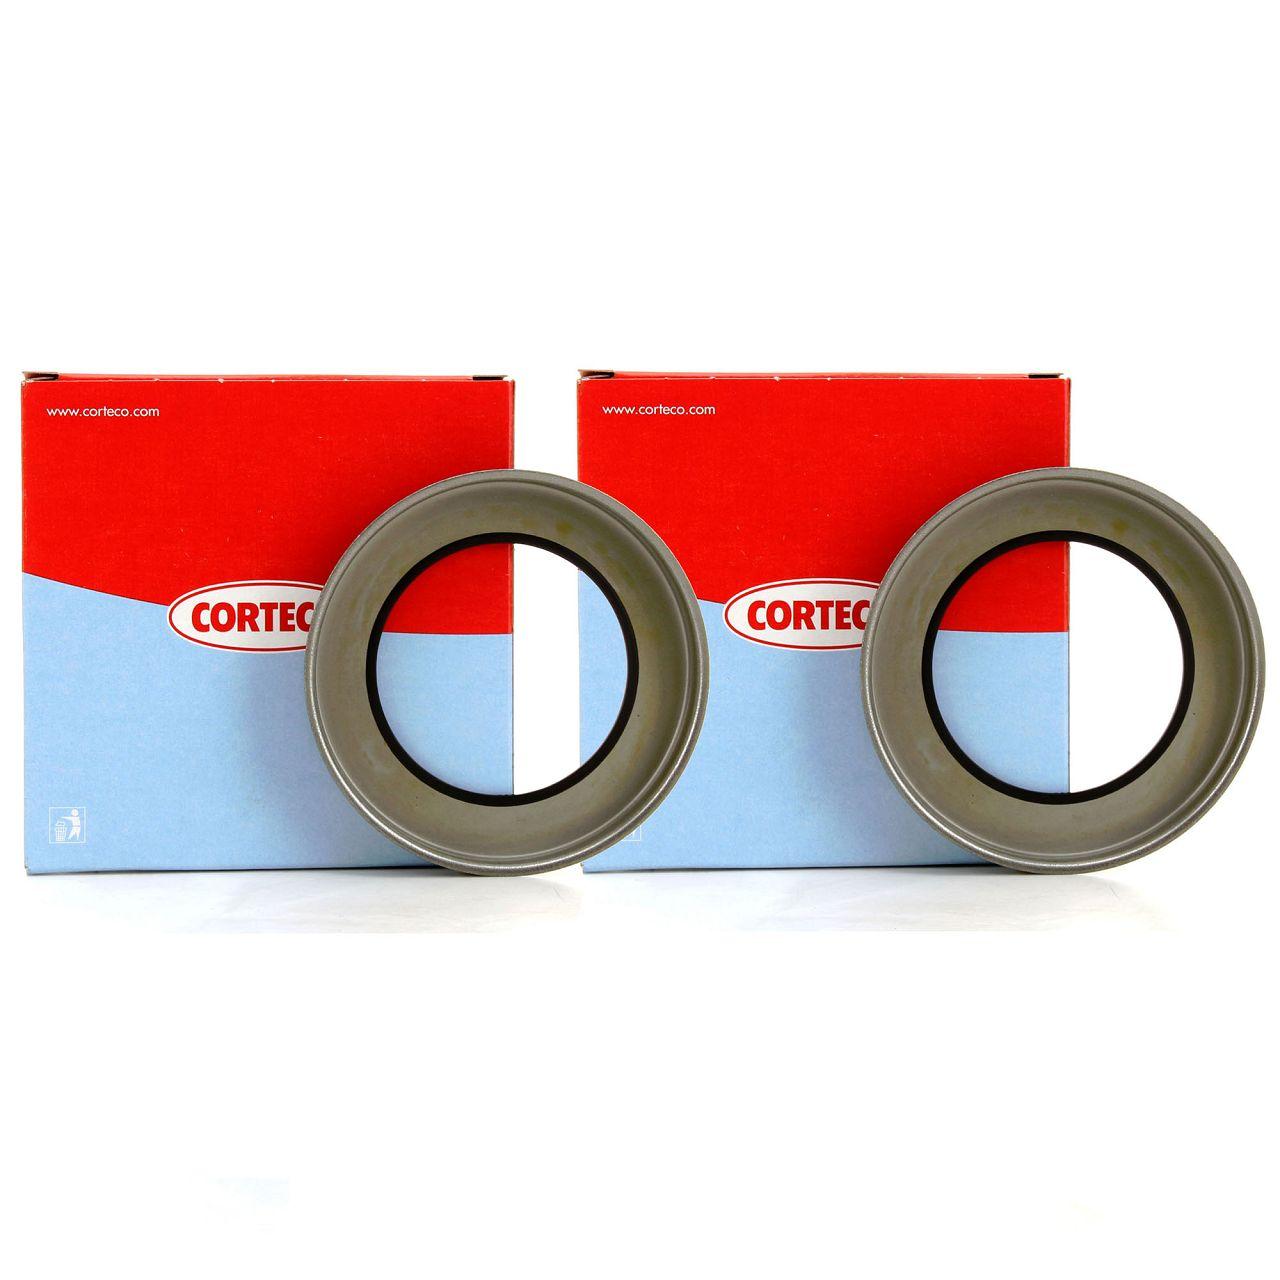 2x CORTECO ABS Ring Sensorring für FORD FIESTA IV V FOCUS I FUSION (JU_) hinten